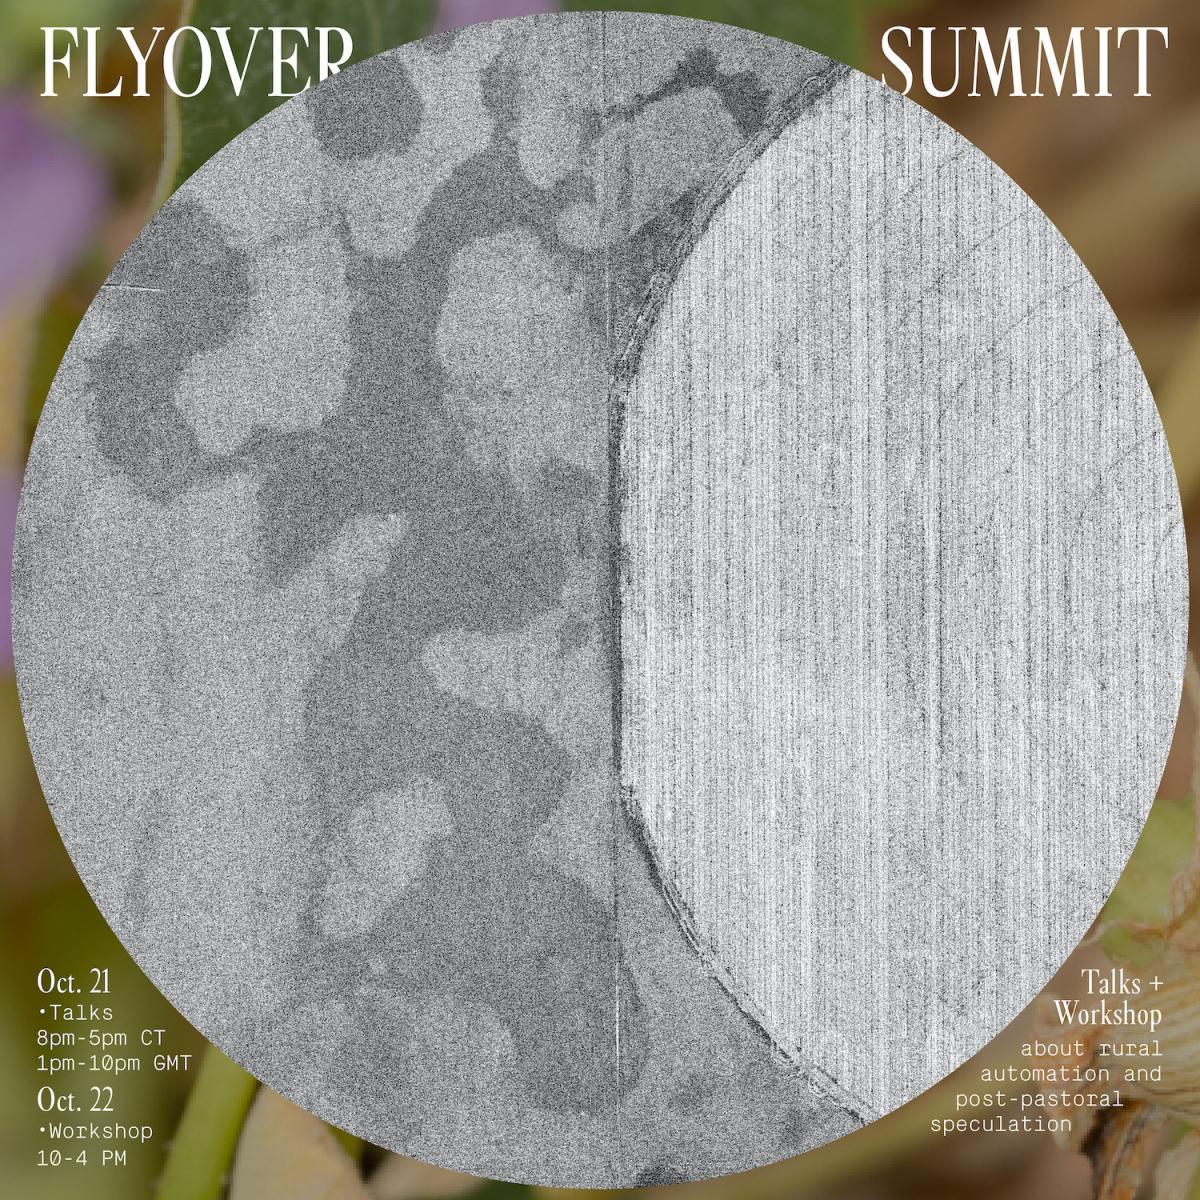 Flyover Summit Talks + Workshop image